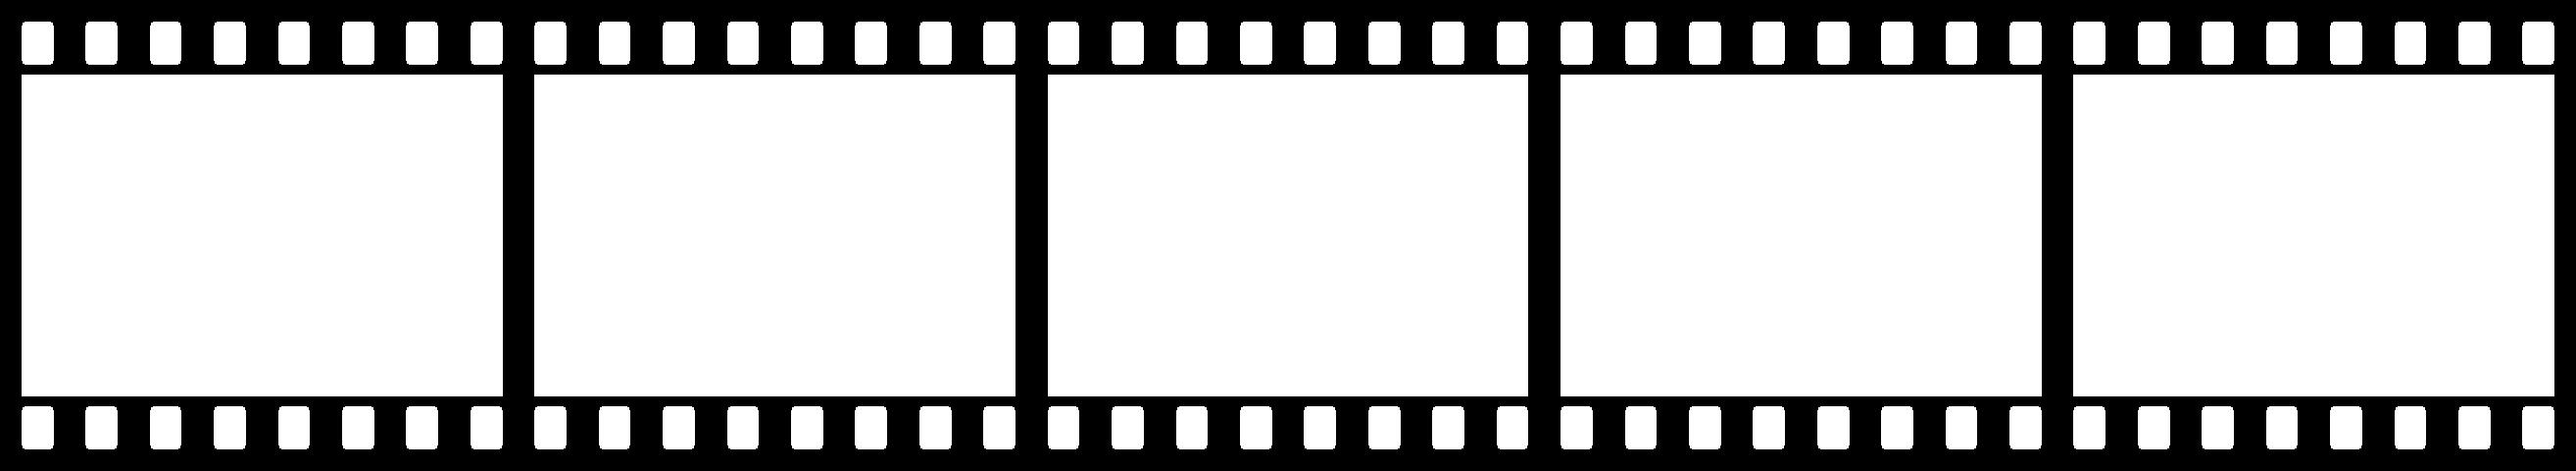 Movie Film Strip Clipart - Google Search-movie film strip clipart - Google Search-10